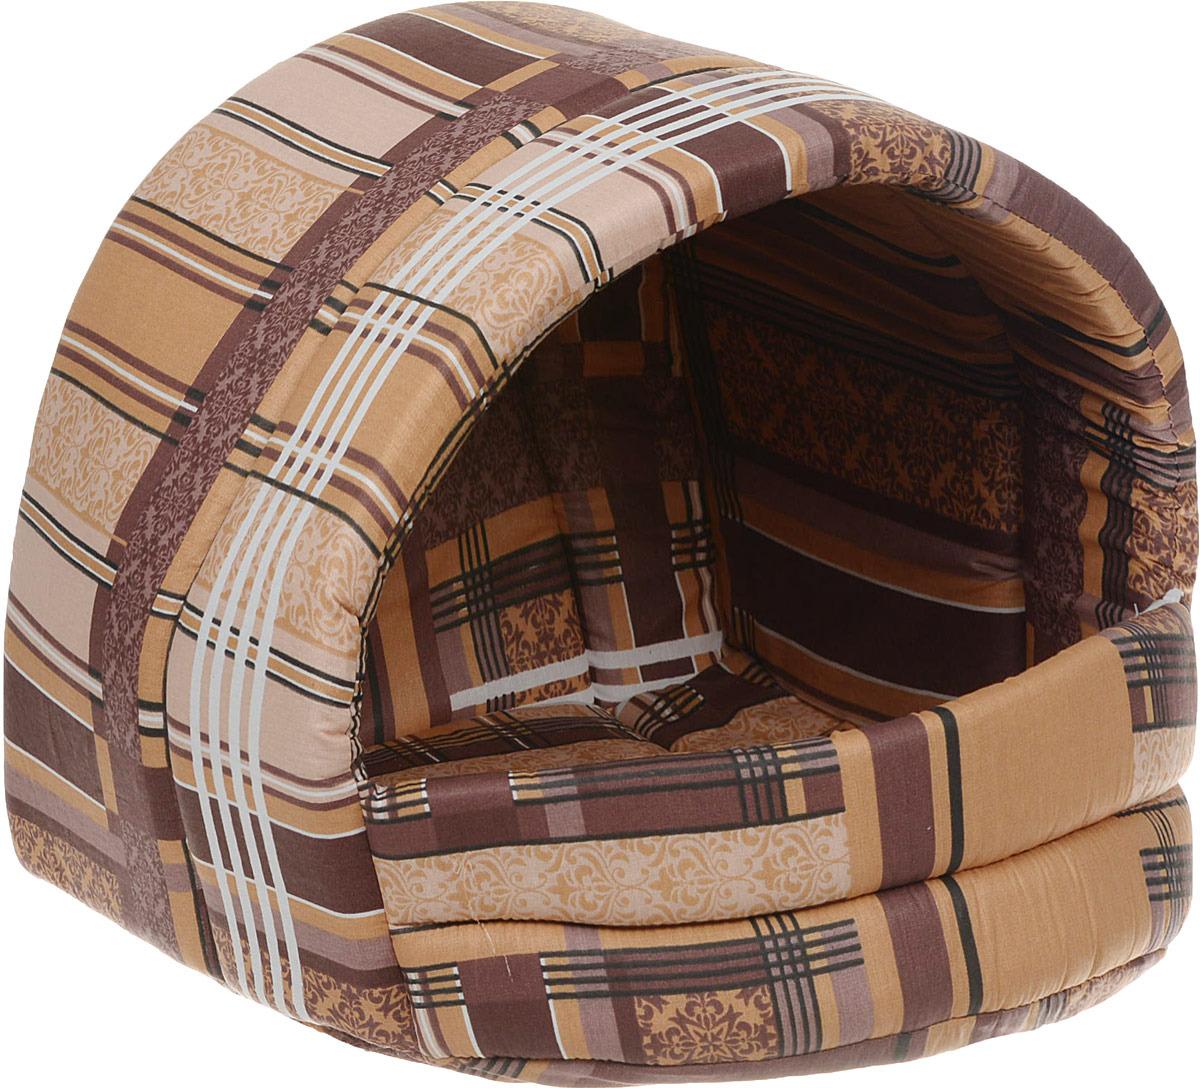 Лежак для животных ЗооМарк Домик-эстрада № 3 Клетка, Д-03КБ, бежевый, 50 х 45 х 35 см цена